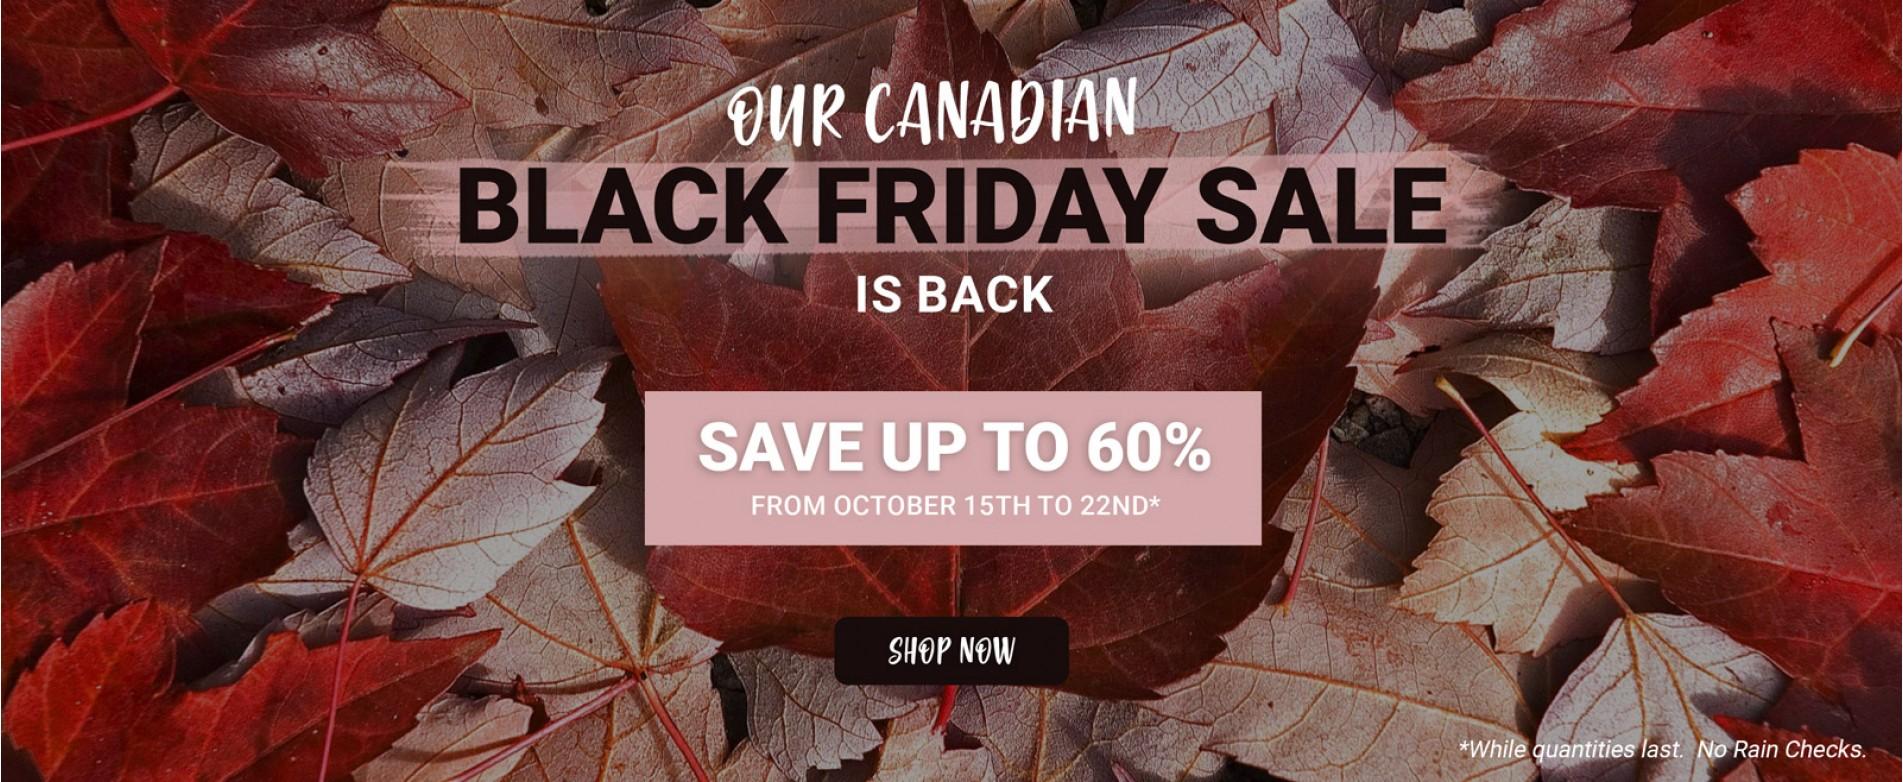 Canadian Black Friday